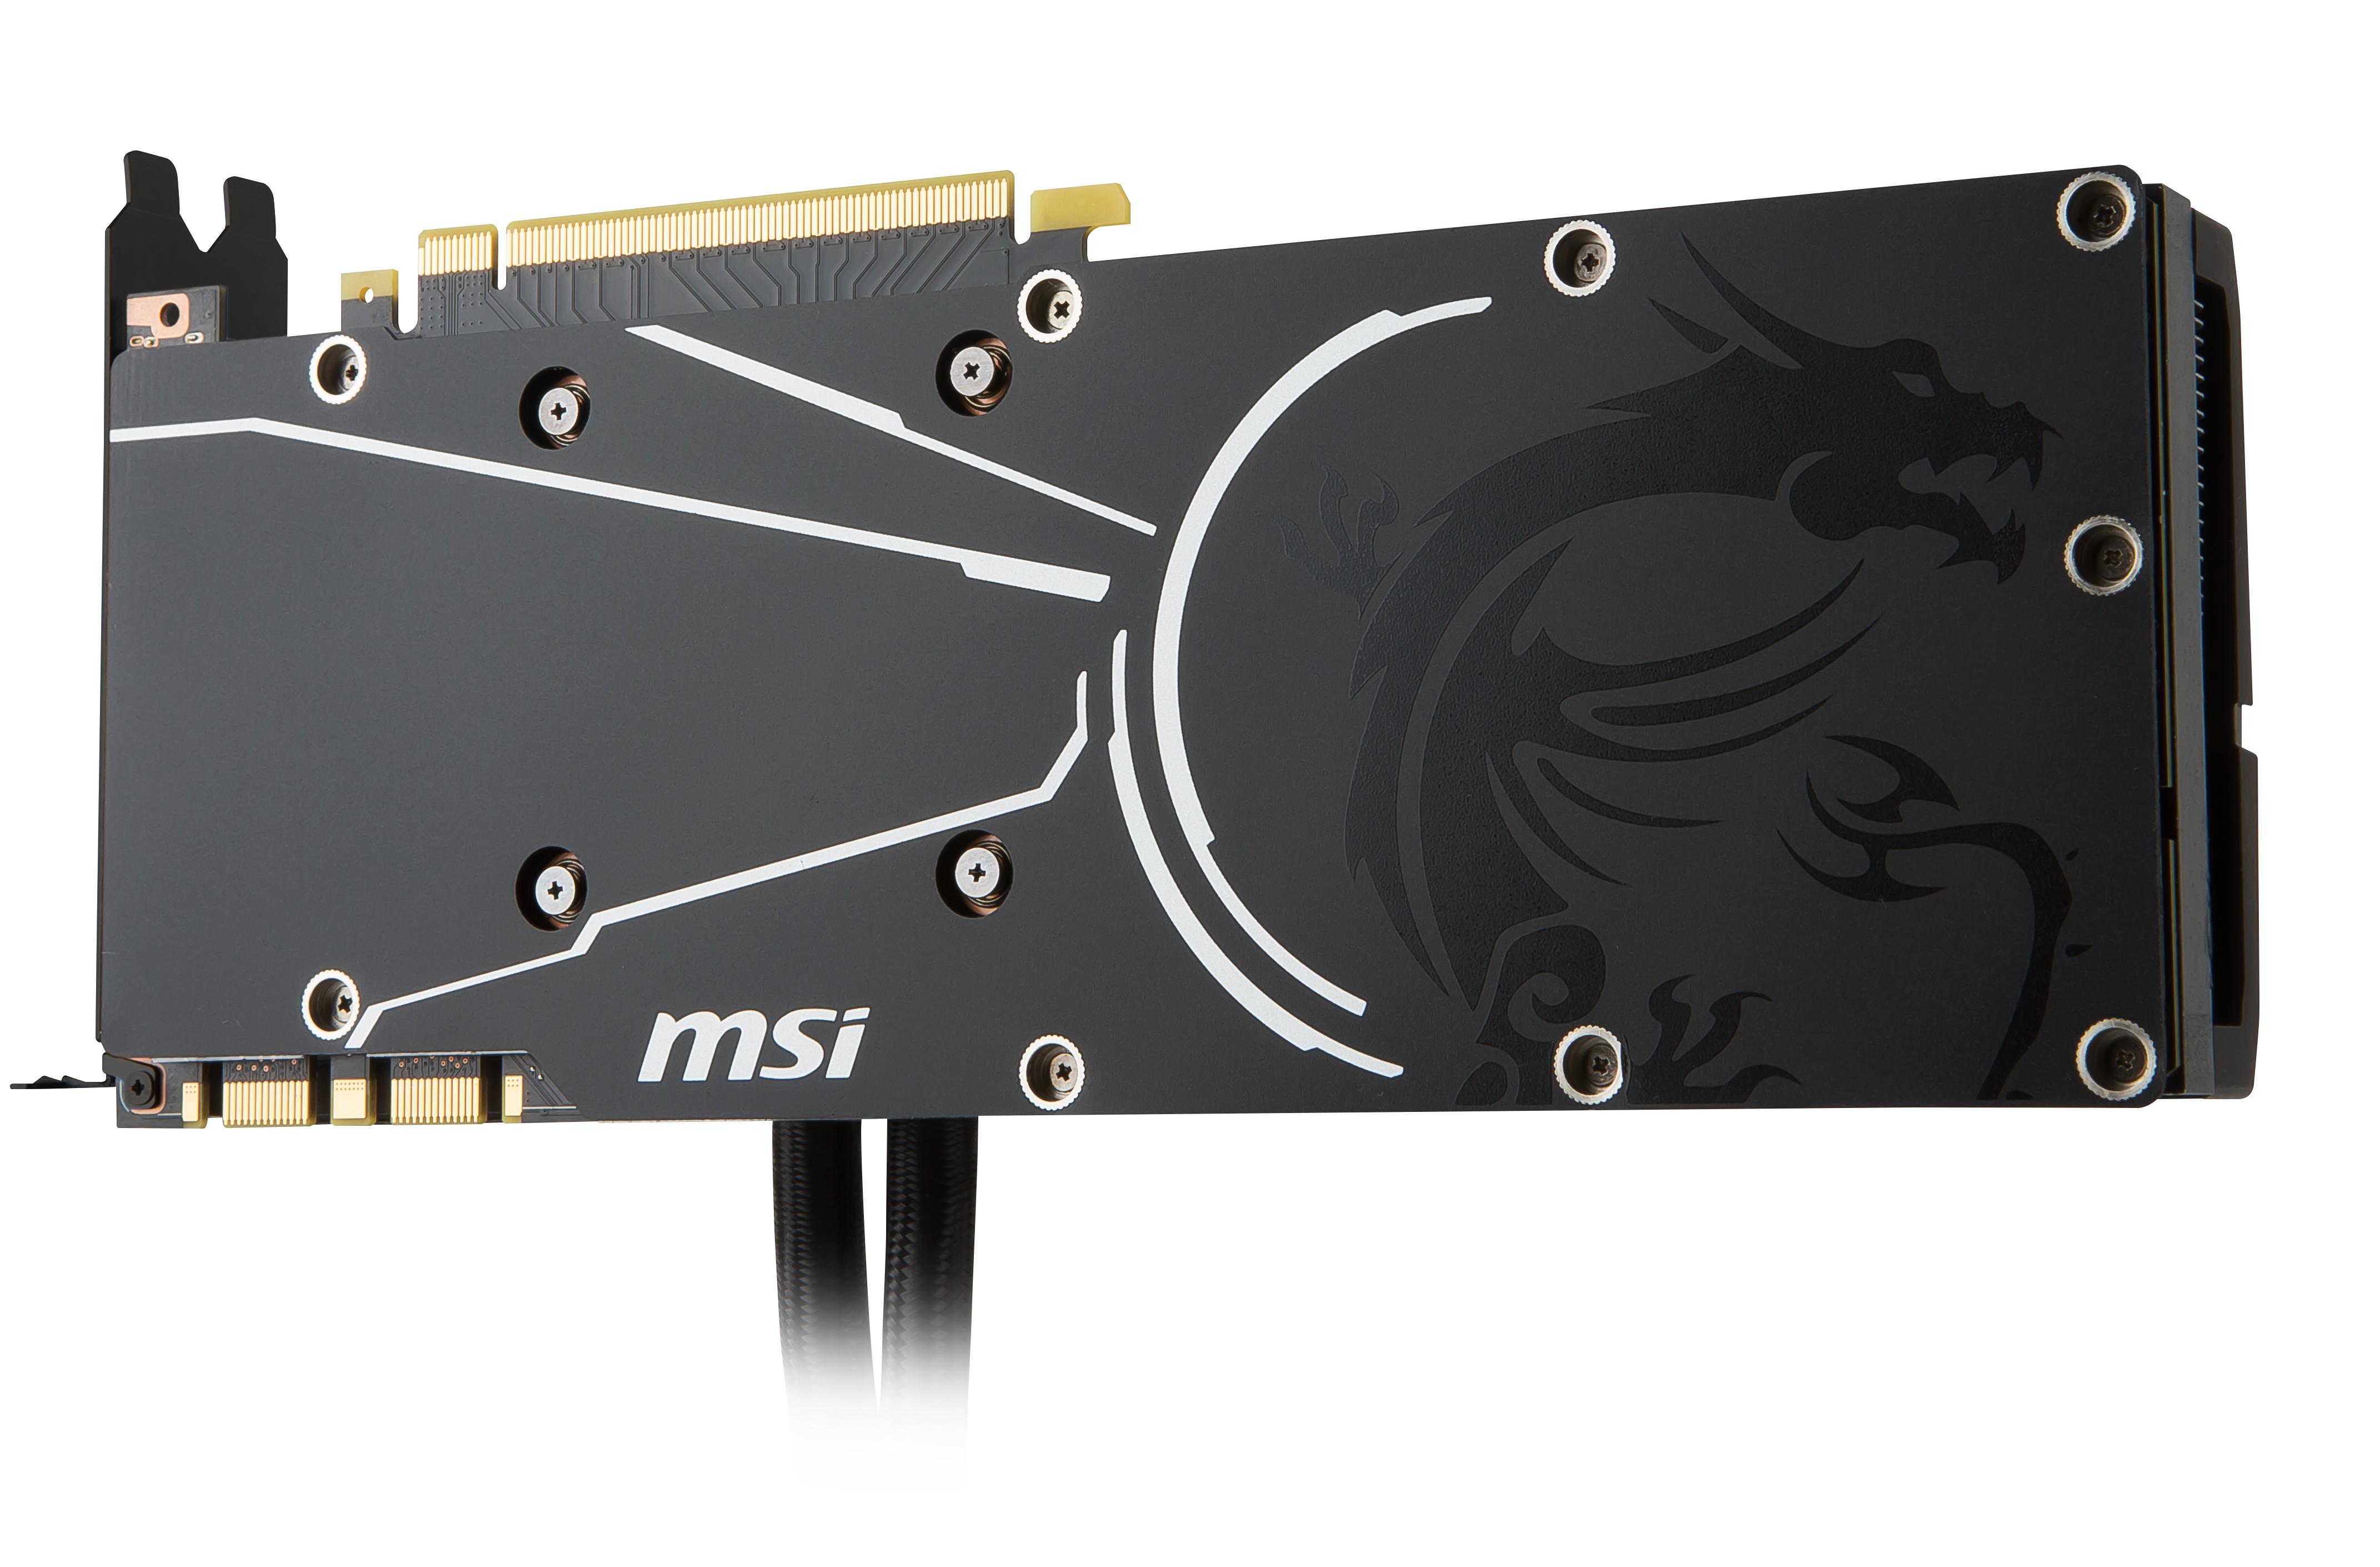 MSI GeForce GTX 1070 Sea Hawk X GTX 1070 SEA HAWK X